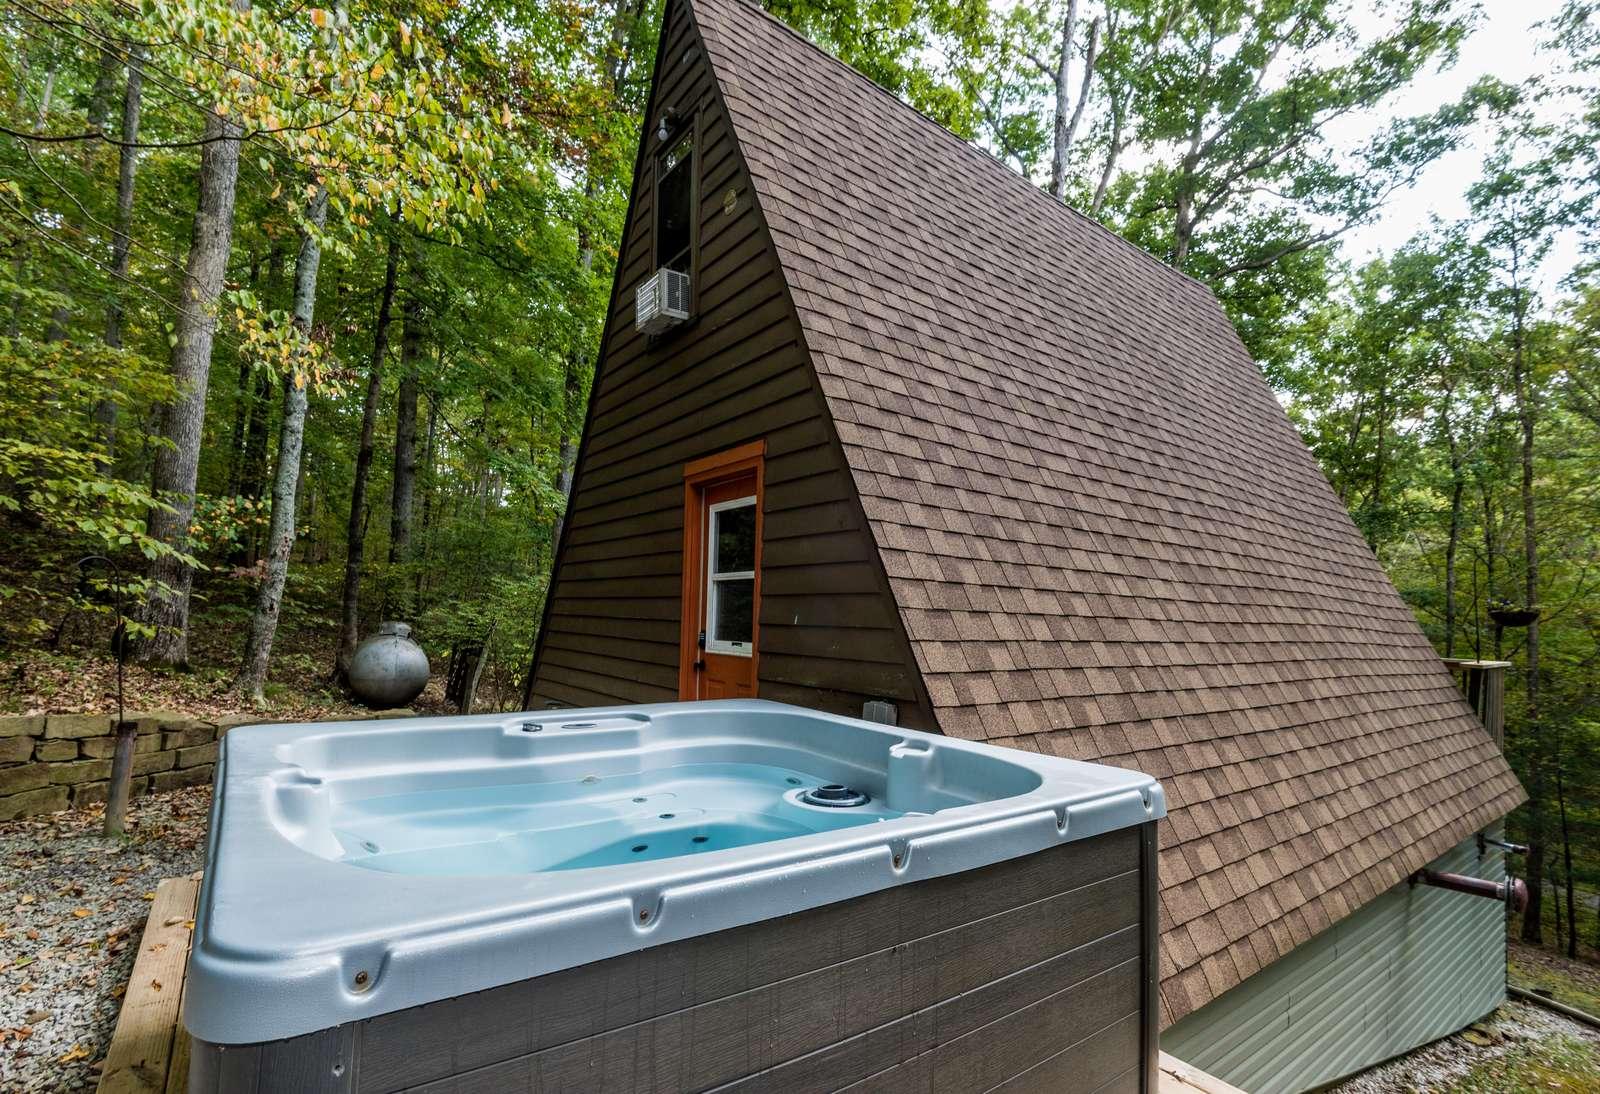 Robyn's Nest Vacation Cabin - property